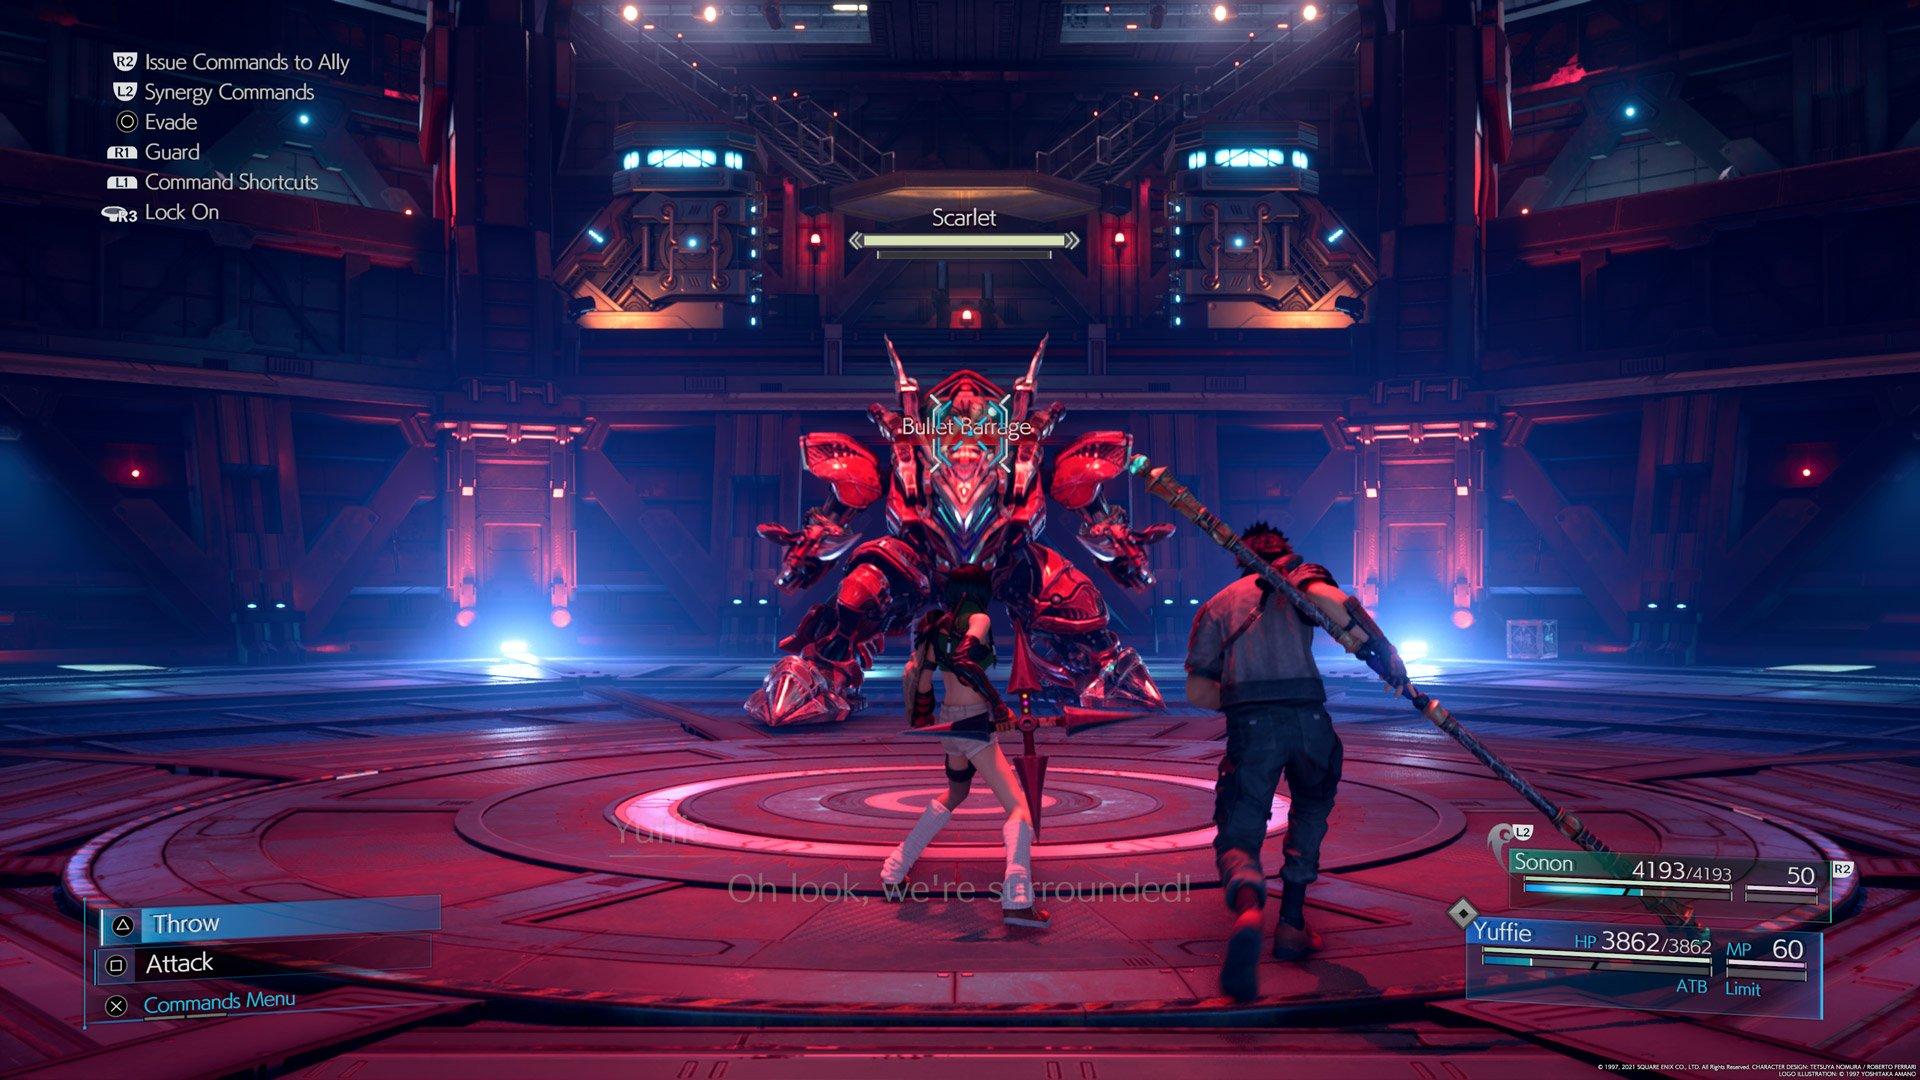 zrzut ekranu z gry Final Fantasy 7 Remake Intergrade